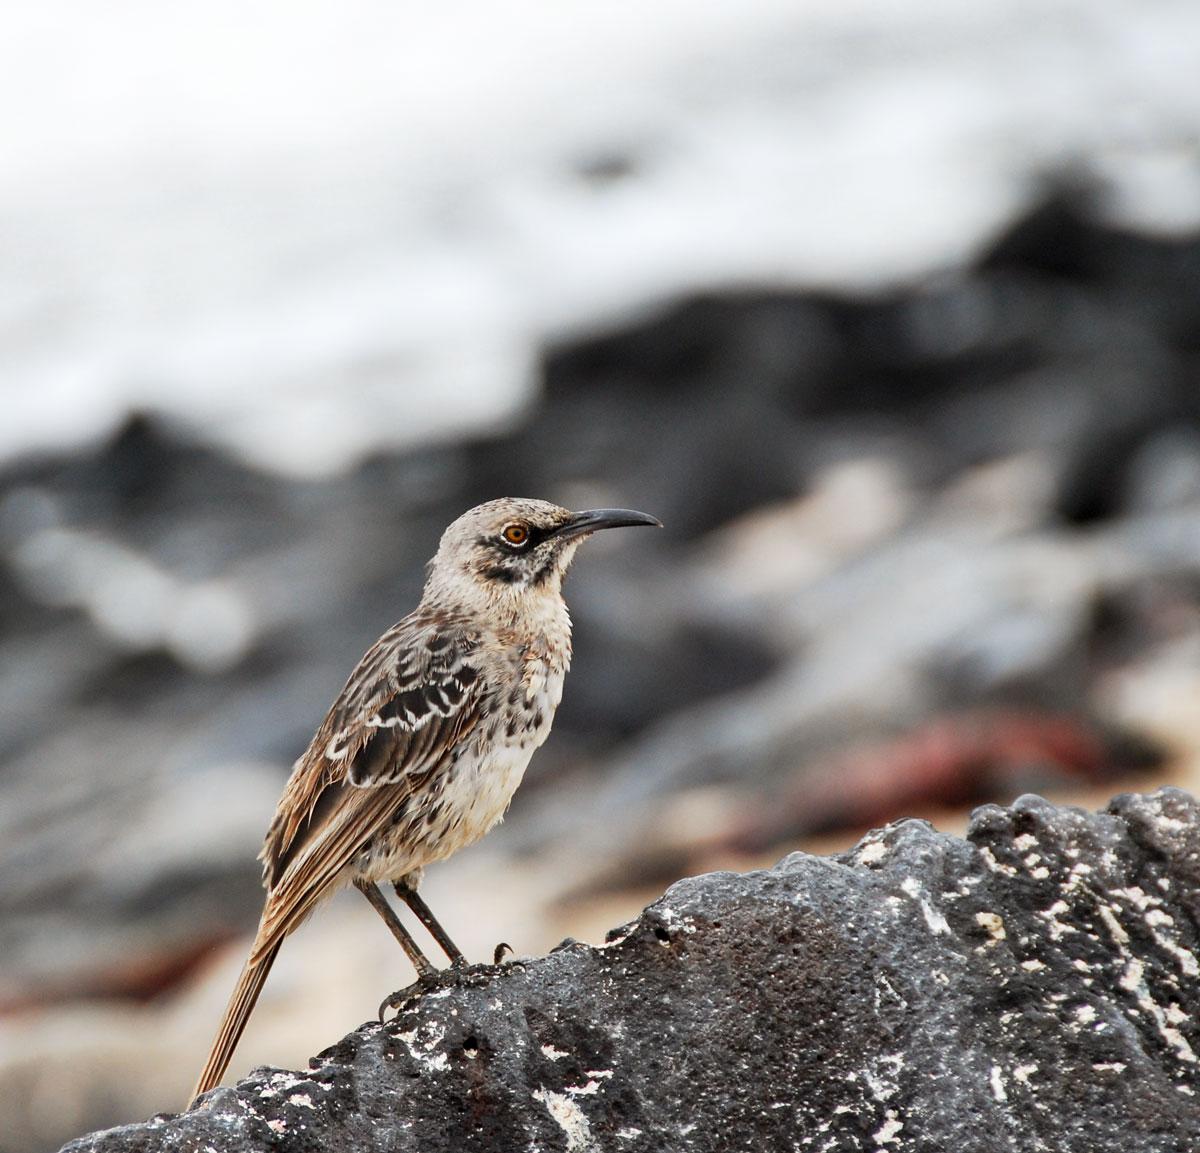 Galapagos, Espanola Galapagosöarna djur resor fågel © resorochaventyr.se All rights reserved